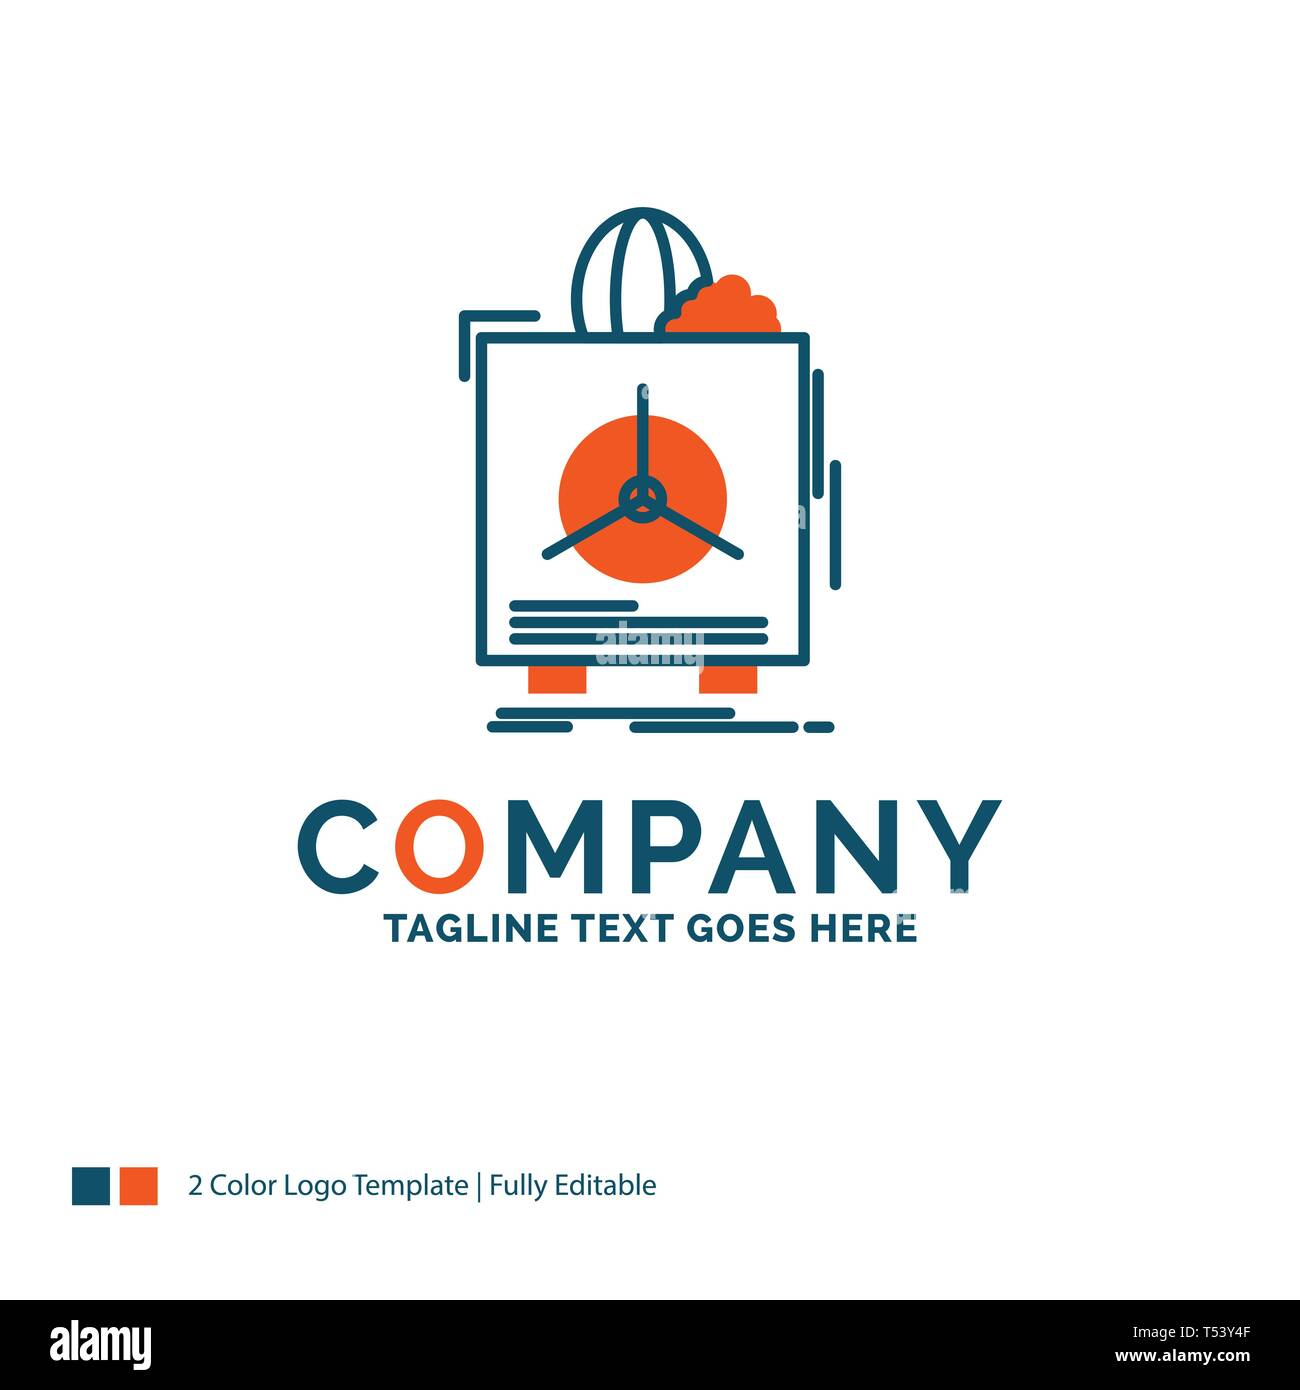 insurance, Fragile, product, warranty, health Logo Design. Blue and Orange Brand Name Design. Place for Tagline. Business Logo template. - Stock Image